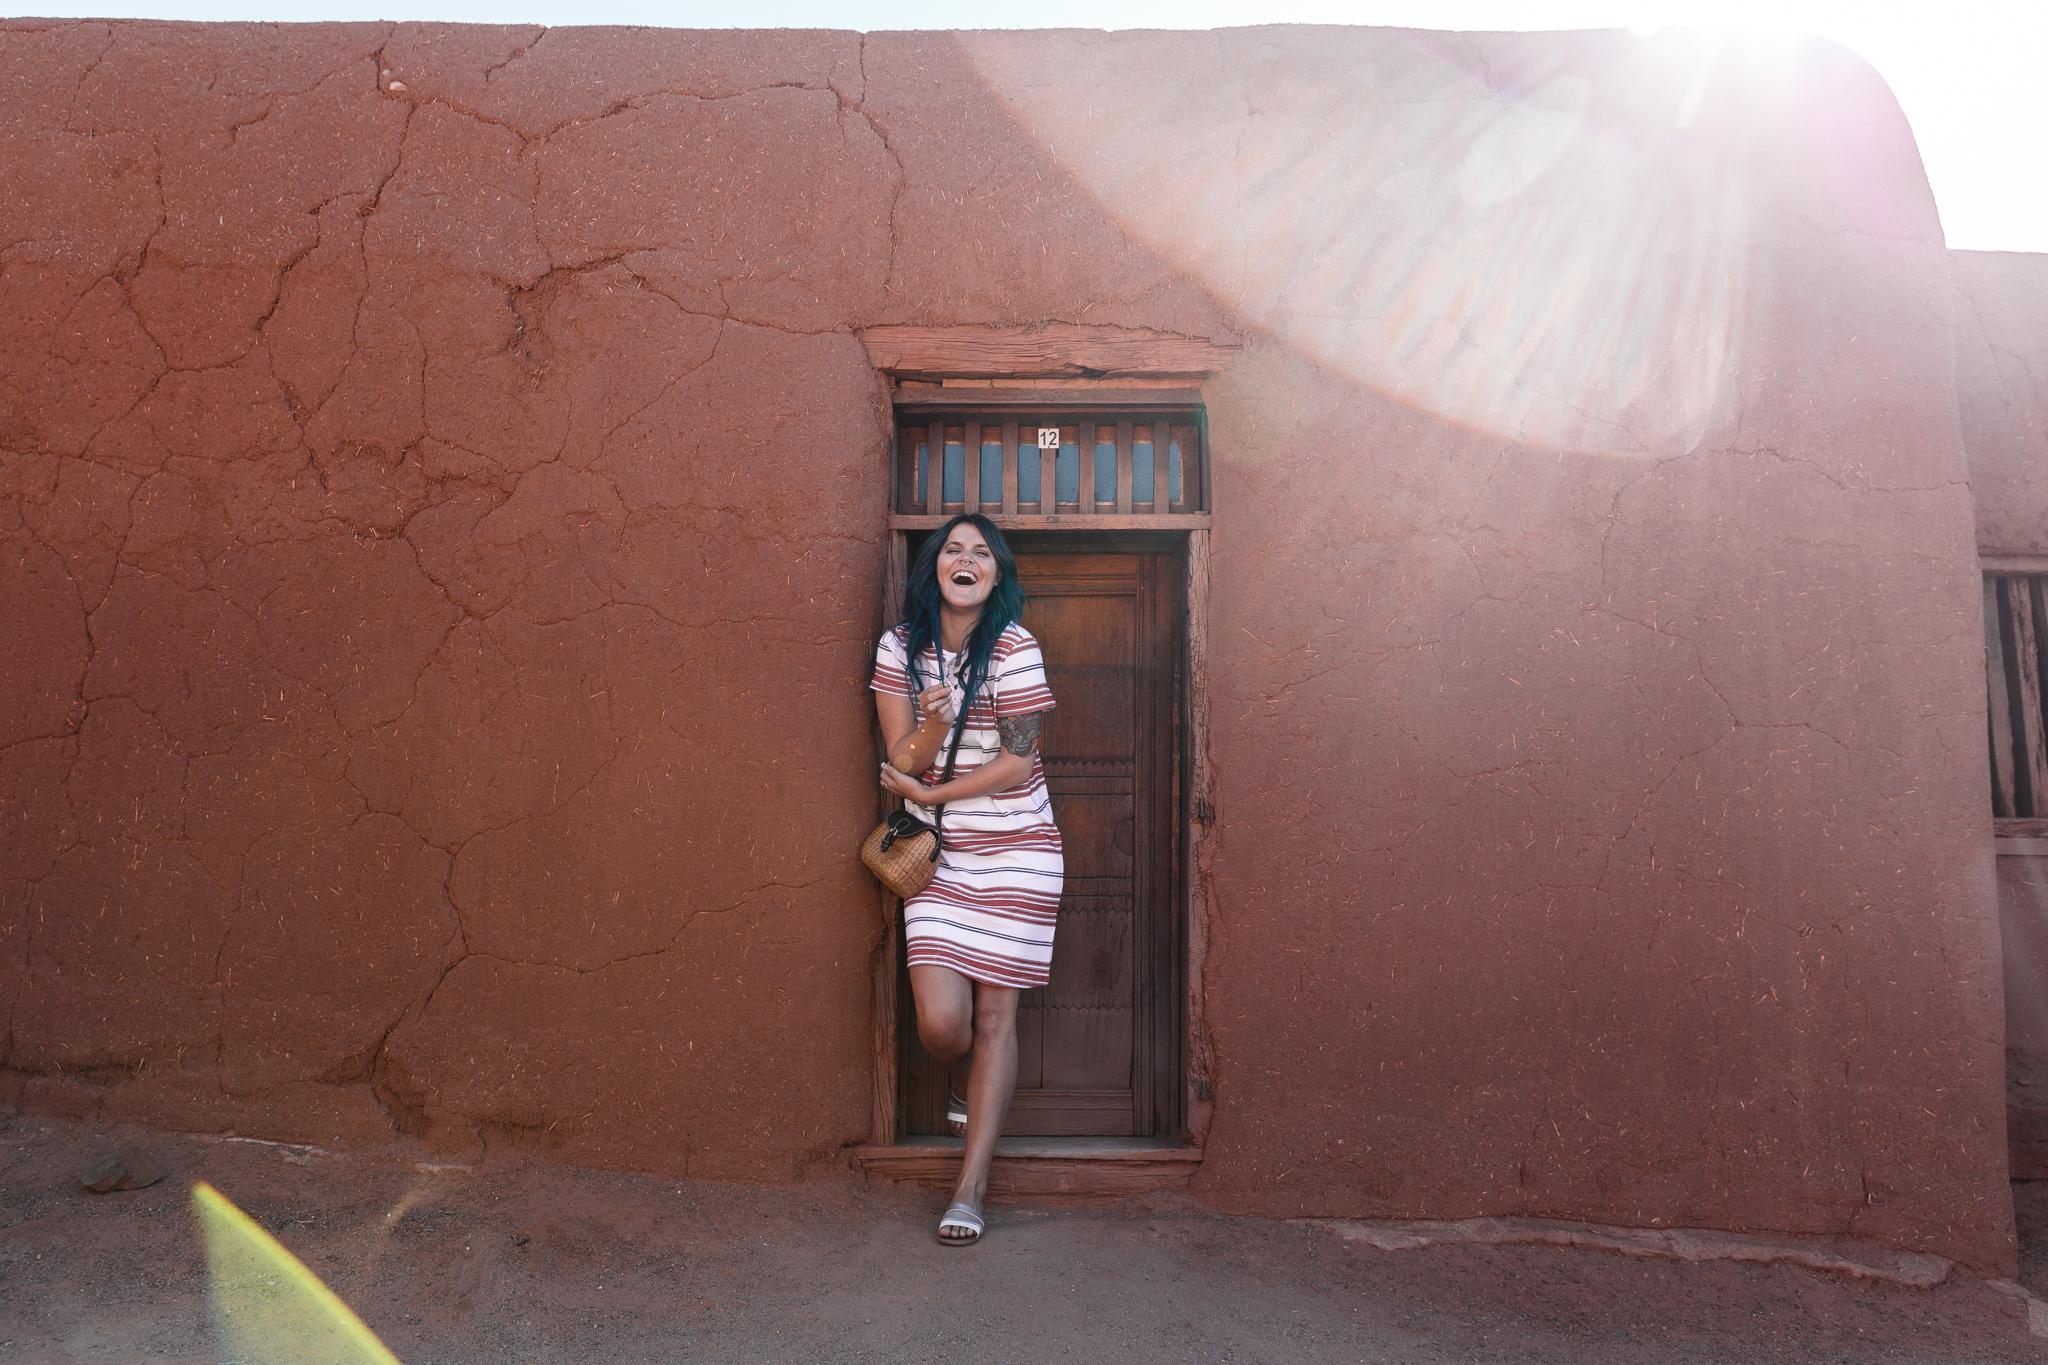 10 Fun Insta-Worthy Activities To Do in Santa Fe // #readysetjetset #santafe #newmexico www.readysetjetset.net